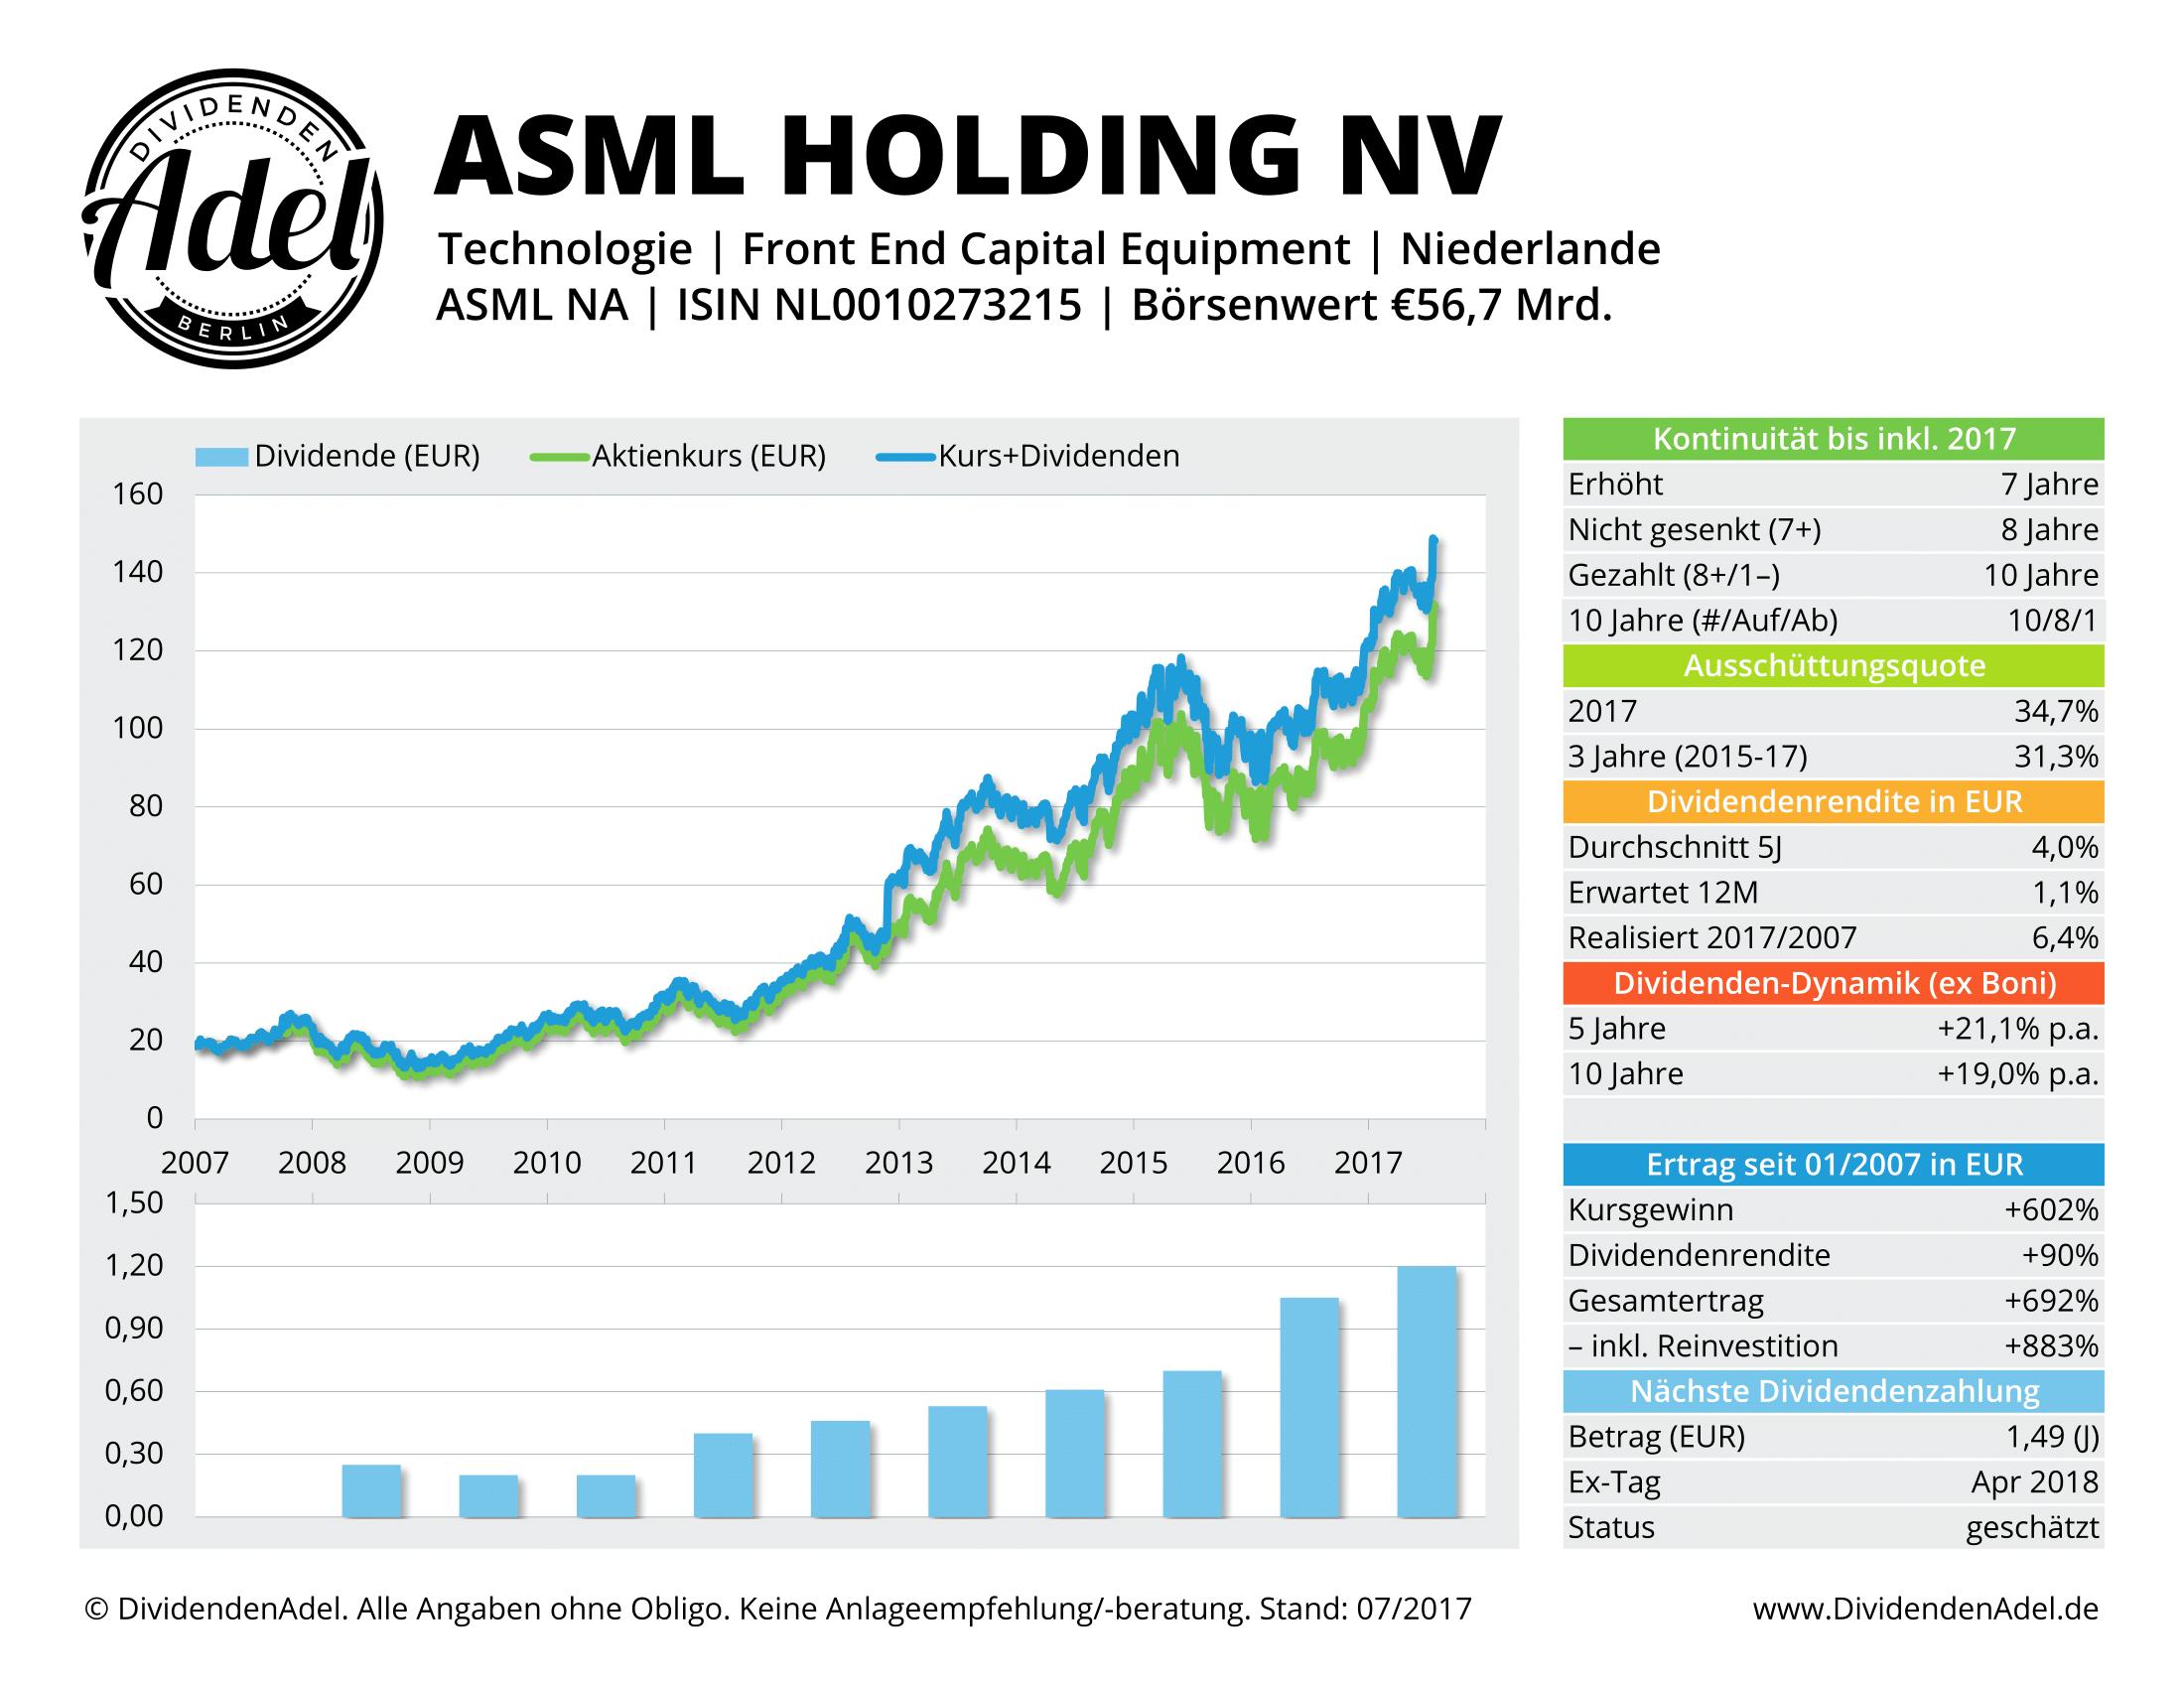 ASML HOLDING NV DividendenAdel-Profil